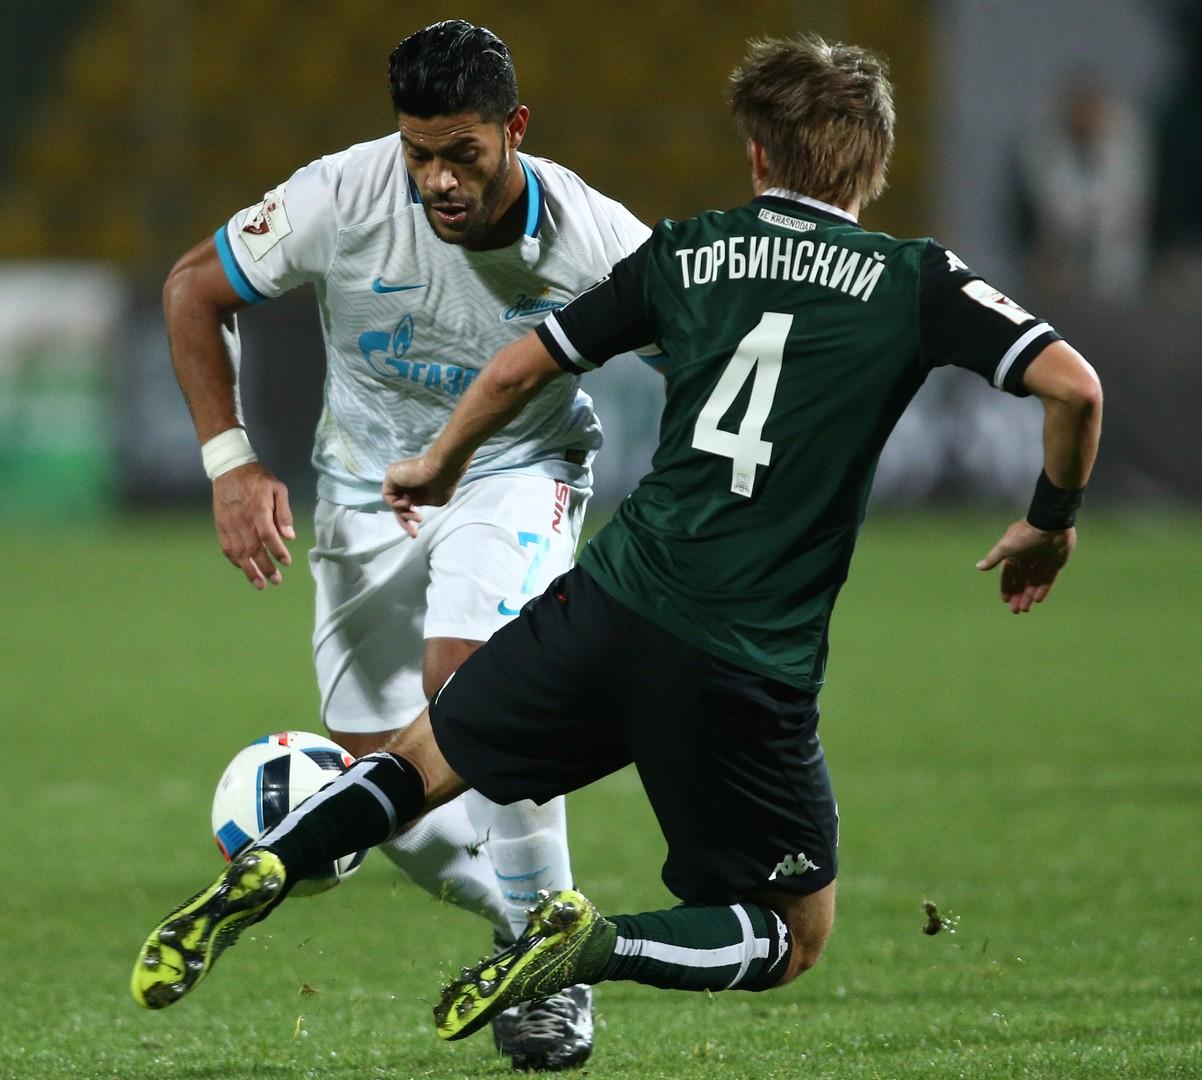 Sankt Petersburgs Star Spieler Hulk, links, versucht an Krasnodars Dmitry Torbinsky vorbeizukommen